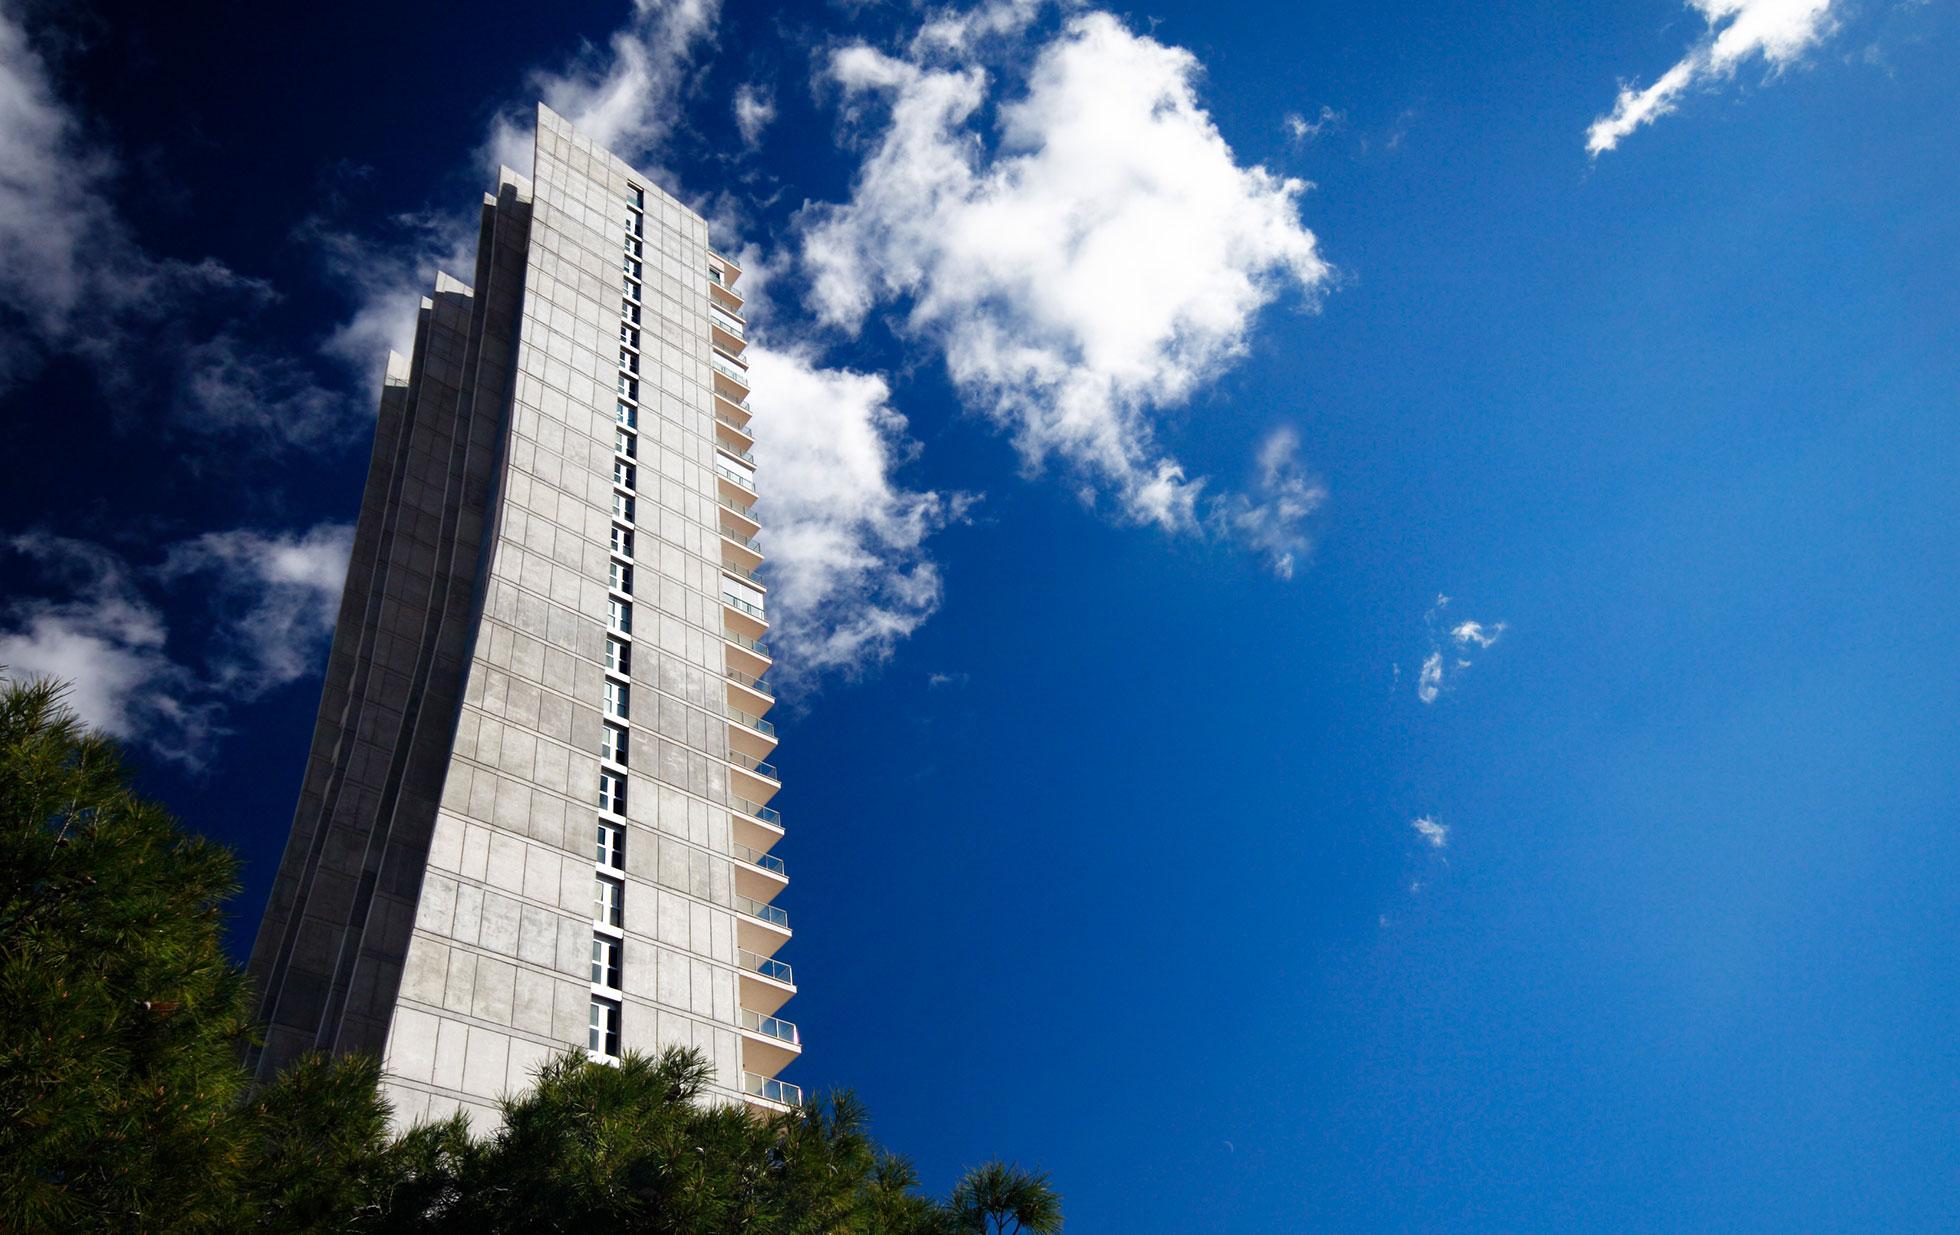 Residencial Torres Miragolf. Arquitectos Benidorm. Arquitectos Alicante. Arquitectos Costa Blanca. eneseis Arquitectura